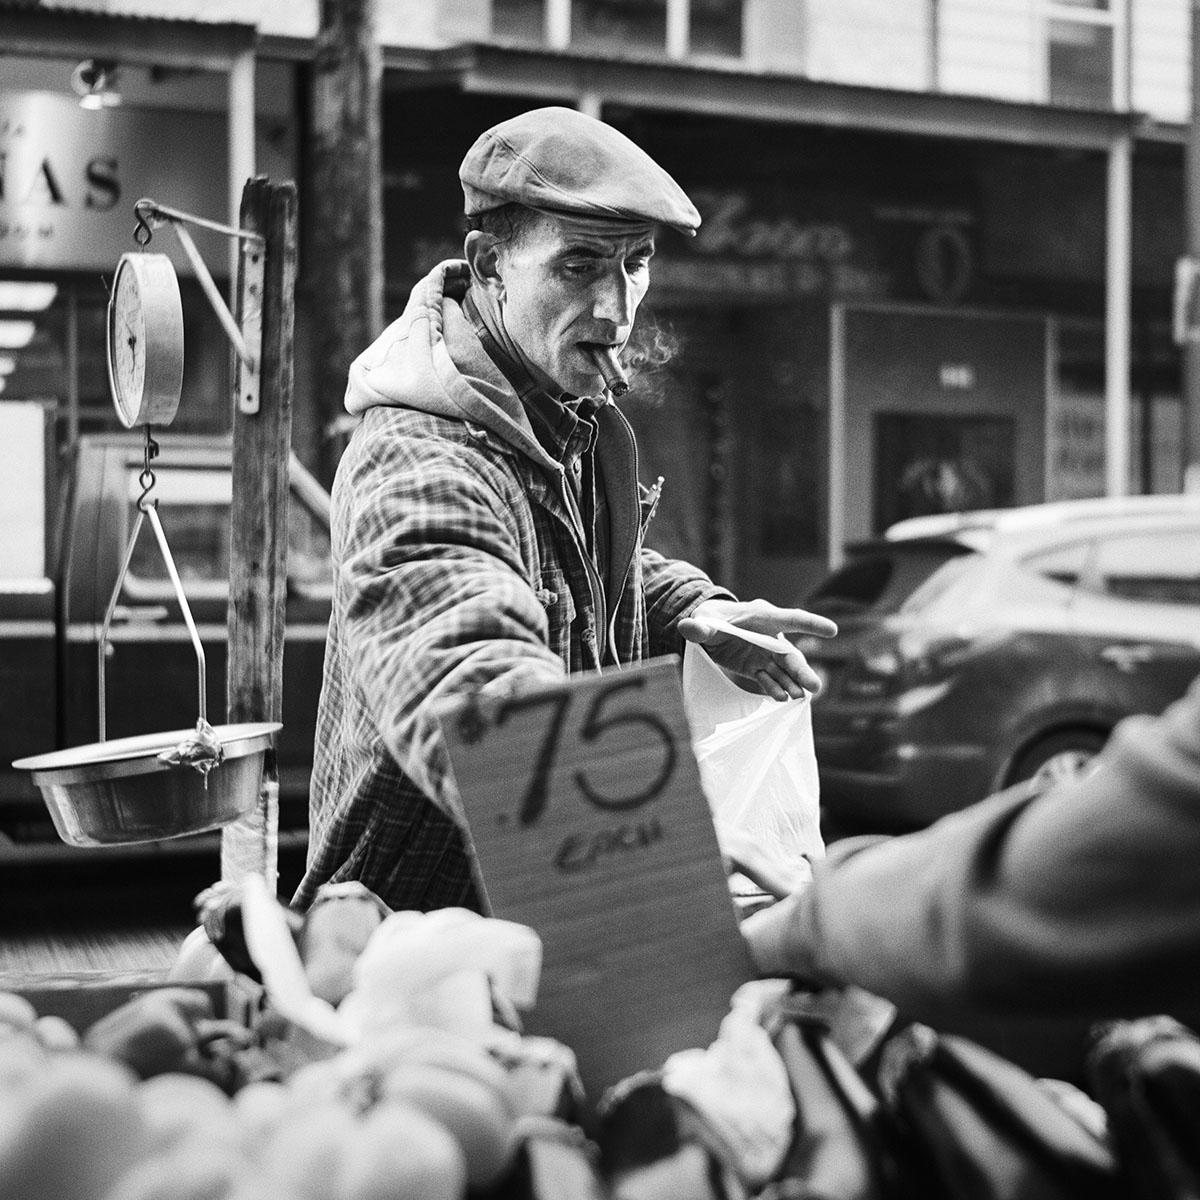 Vendor, Italian Market